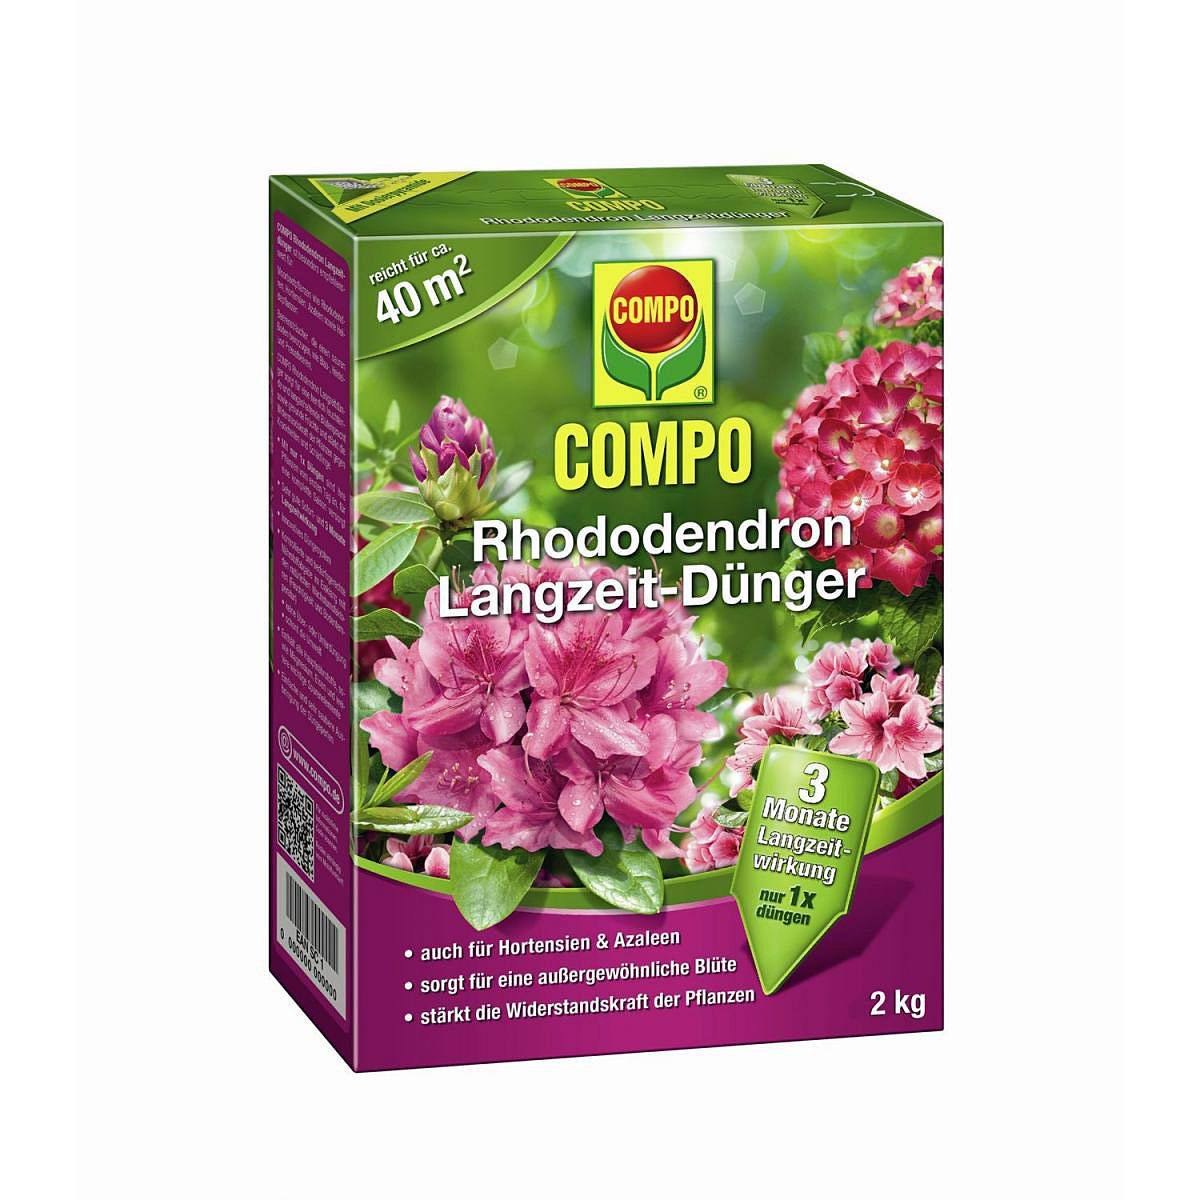 Rhododendron Langzeit-Dünger 2 kg | Garten > Pflanzen > Dünger | Compo